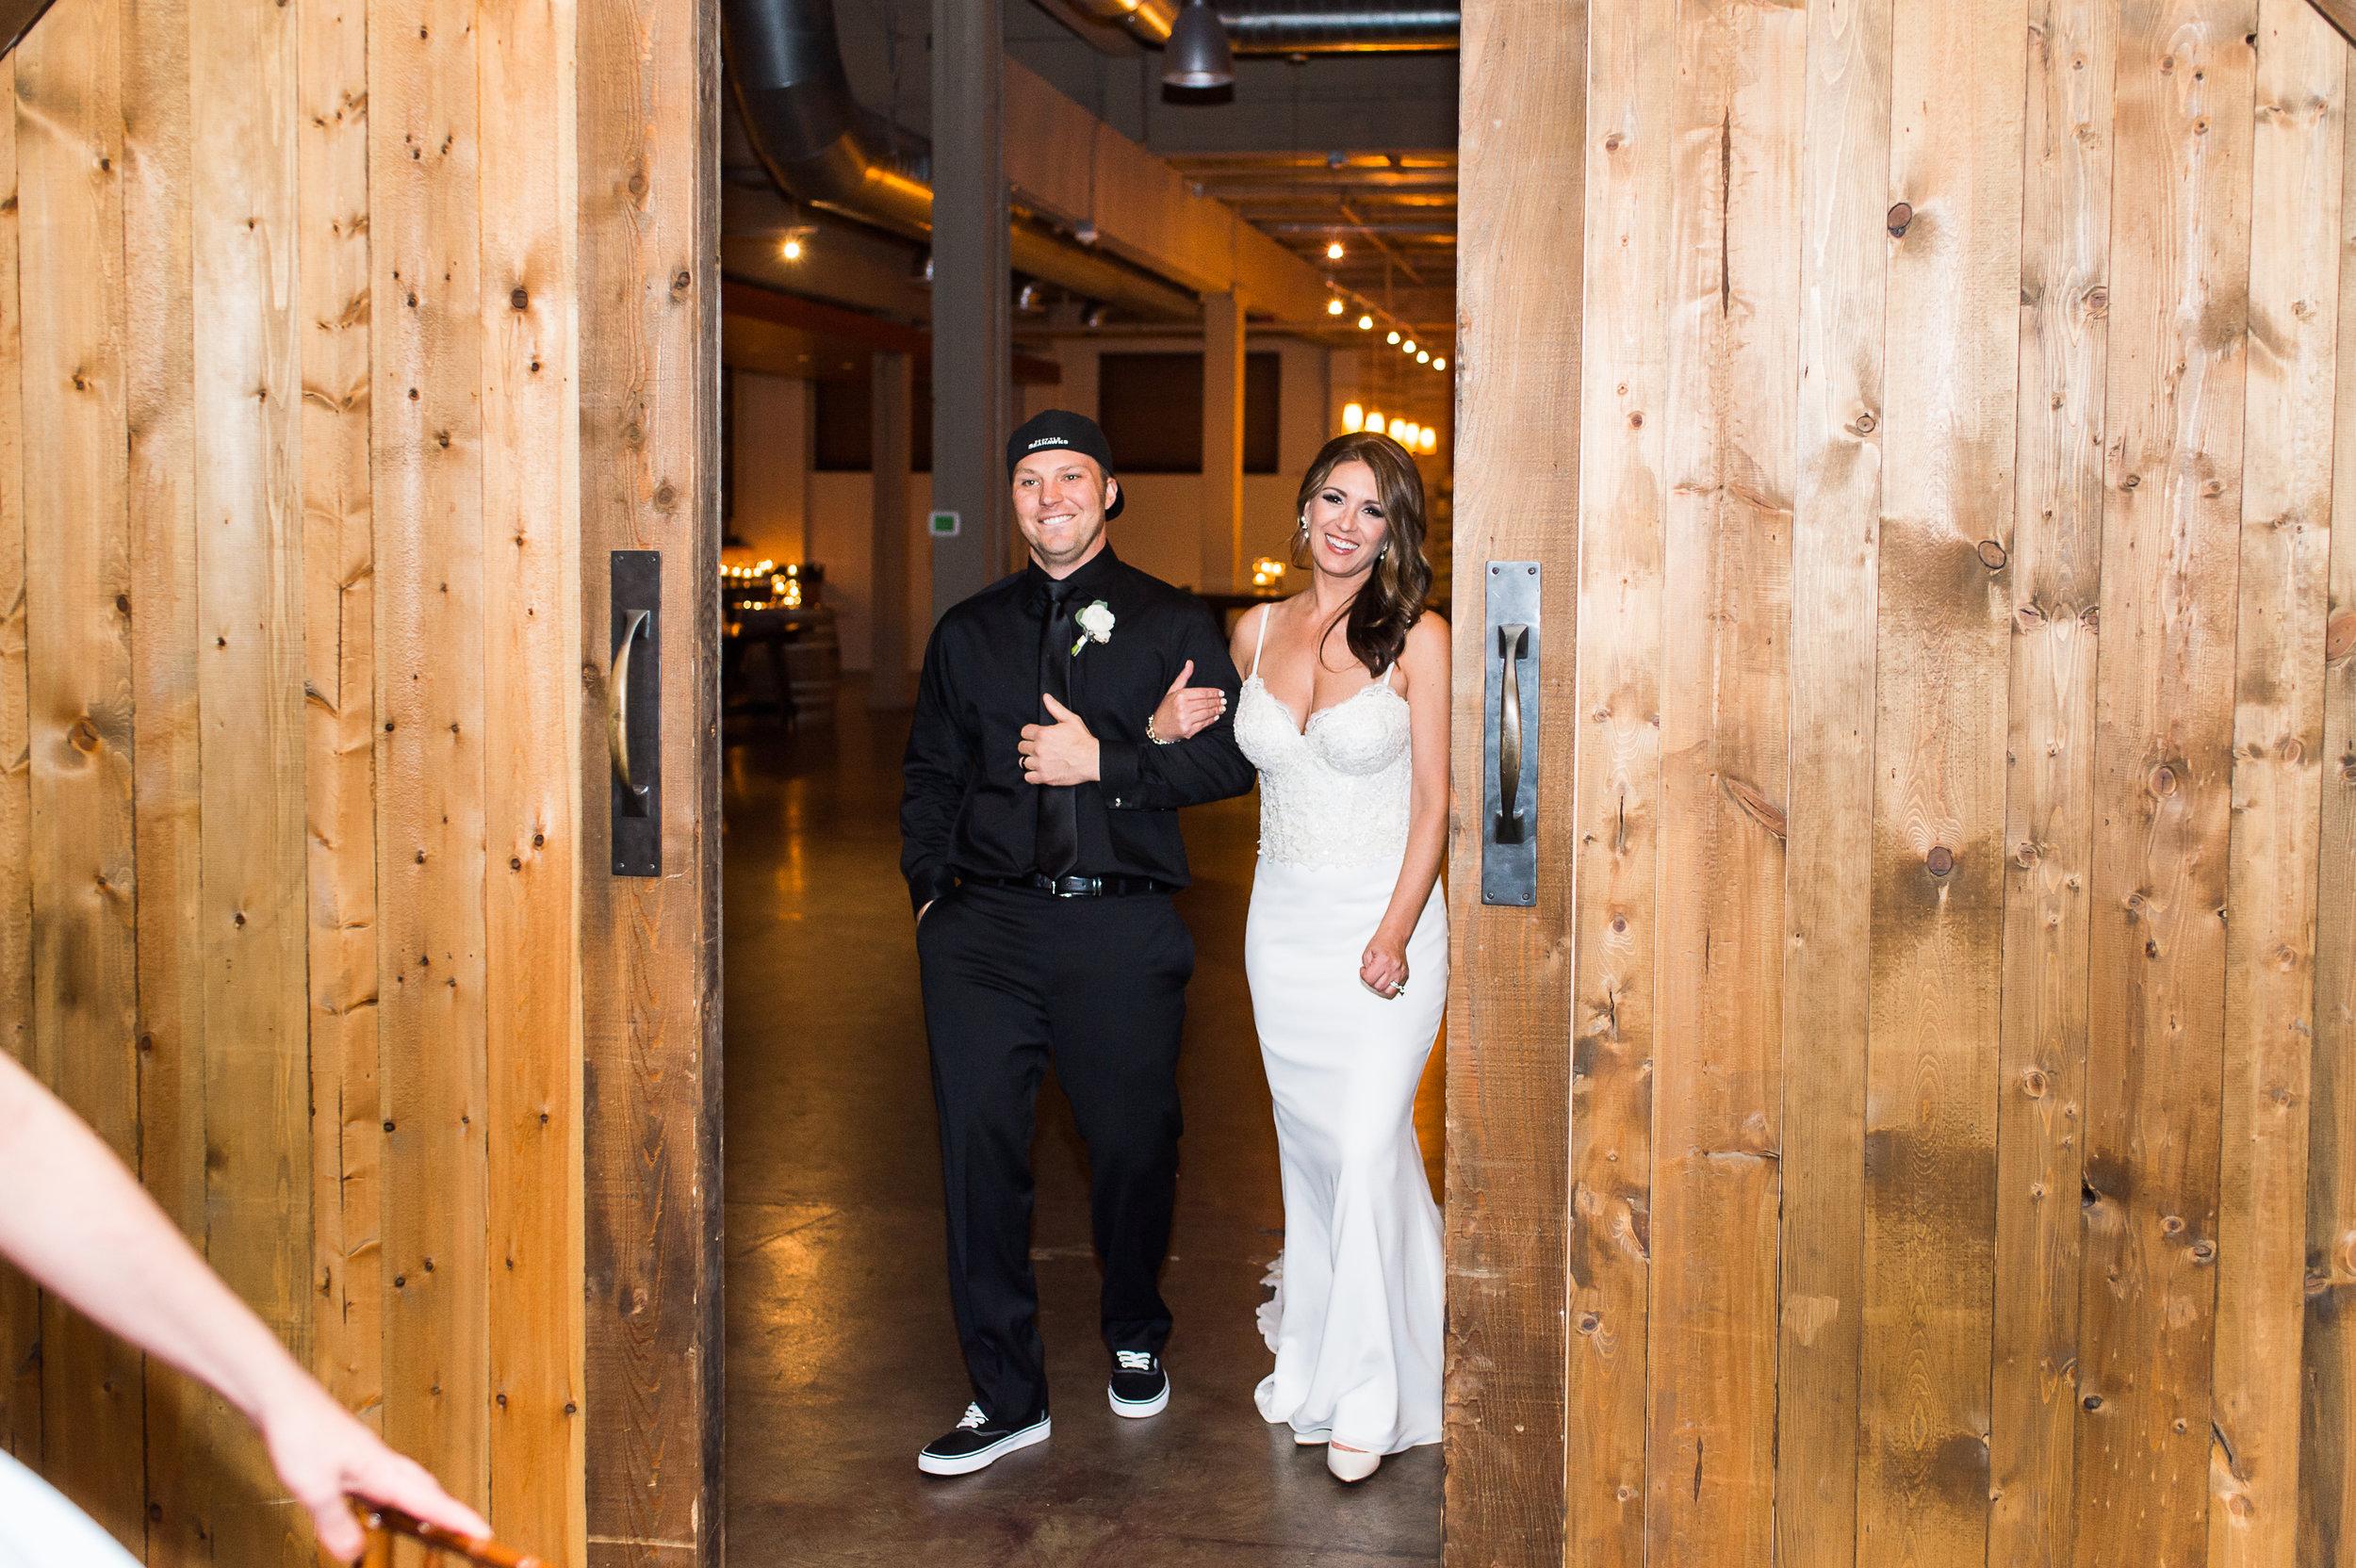 JJ-wedding-Van-Wyhe-Photography-487.jpg